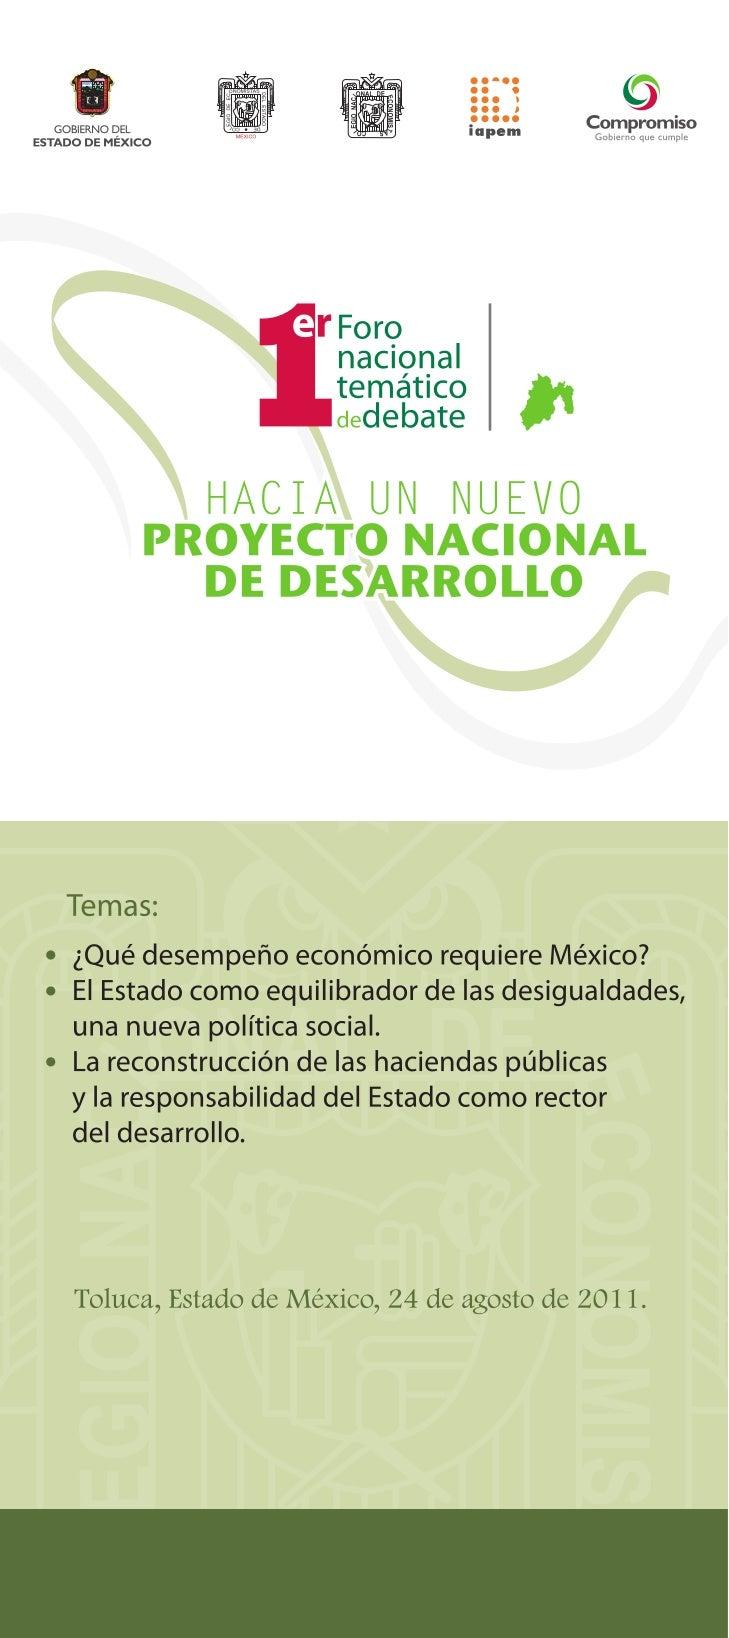 24-08-11 Temáticas - 1er foro debate nacional CNE